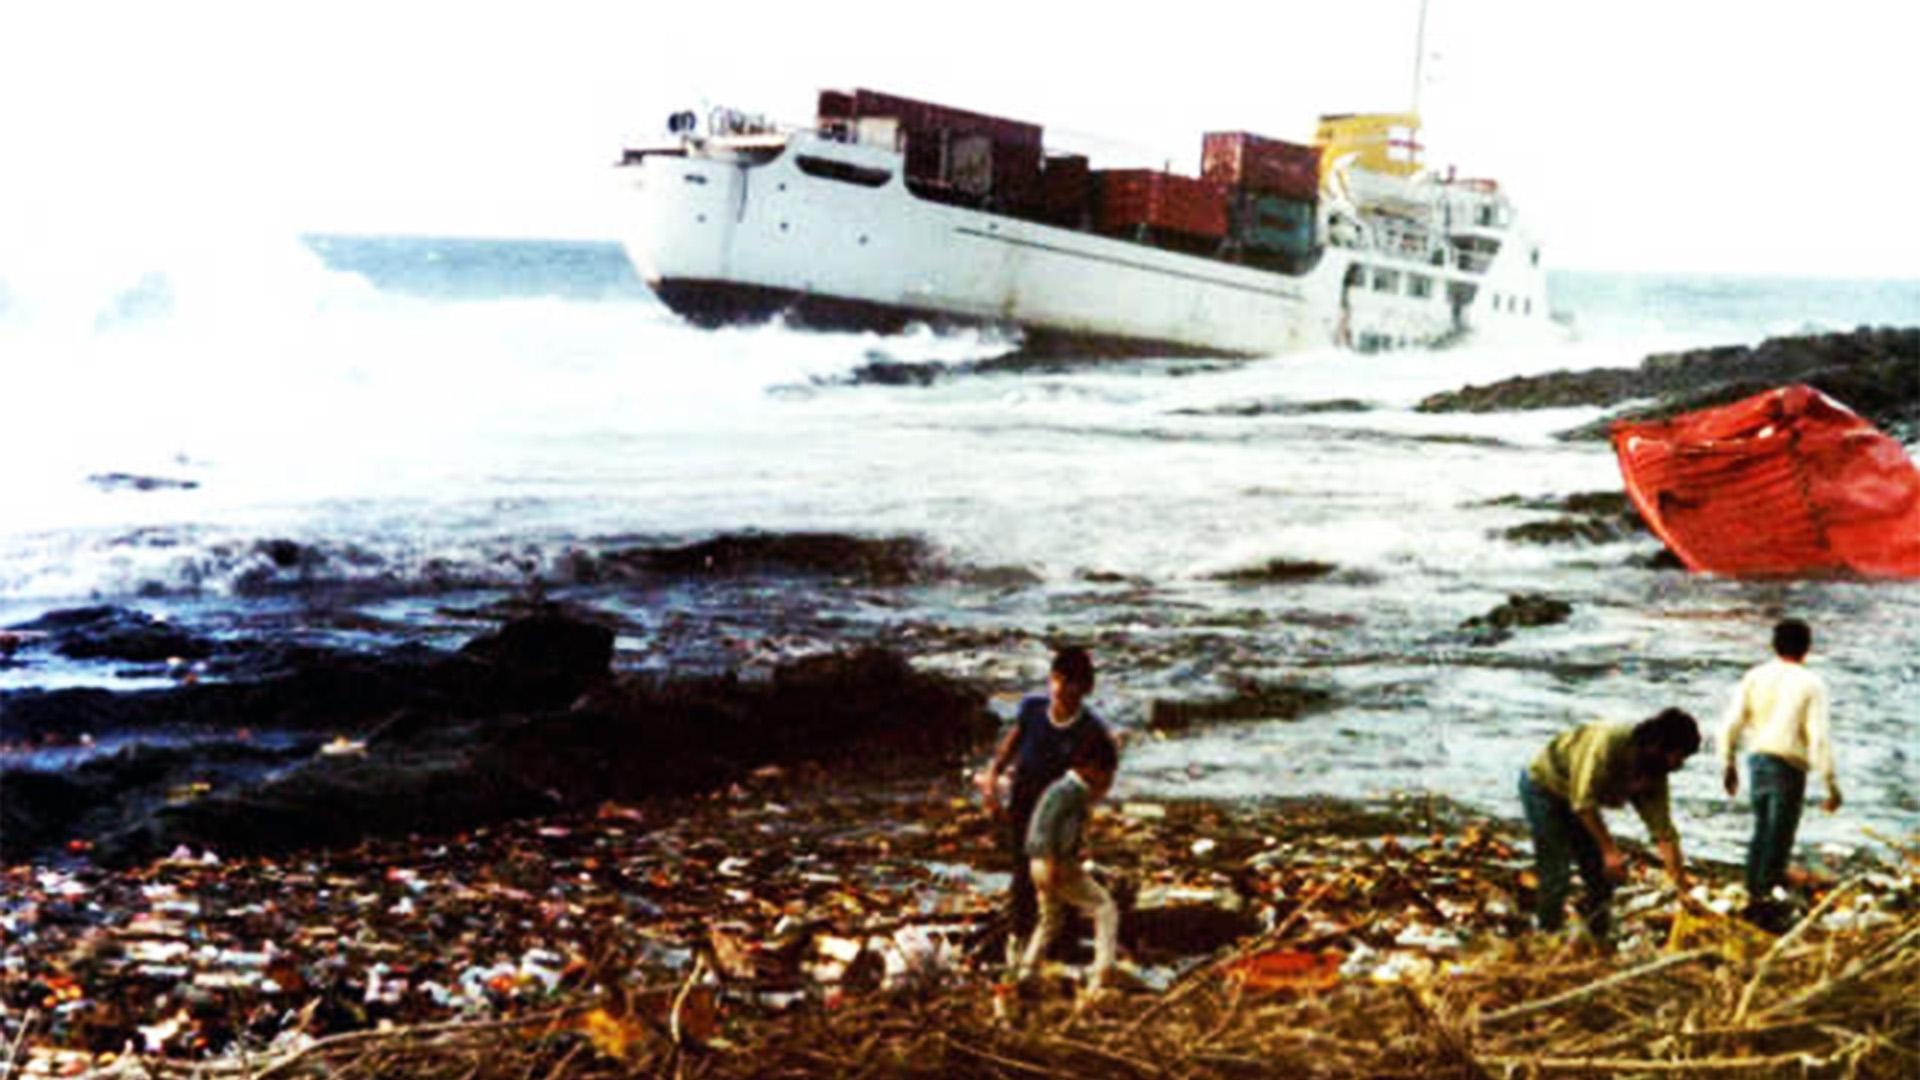 Schiffswrack der Júcar am Playa Valle de Santa Inés Fuerteventura.